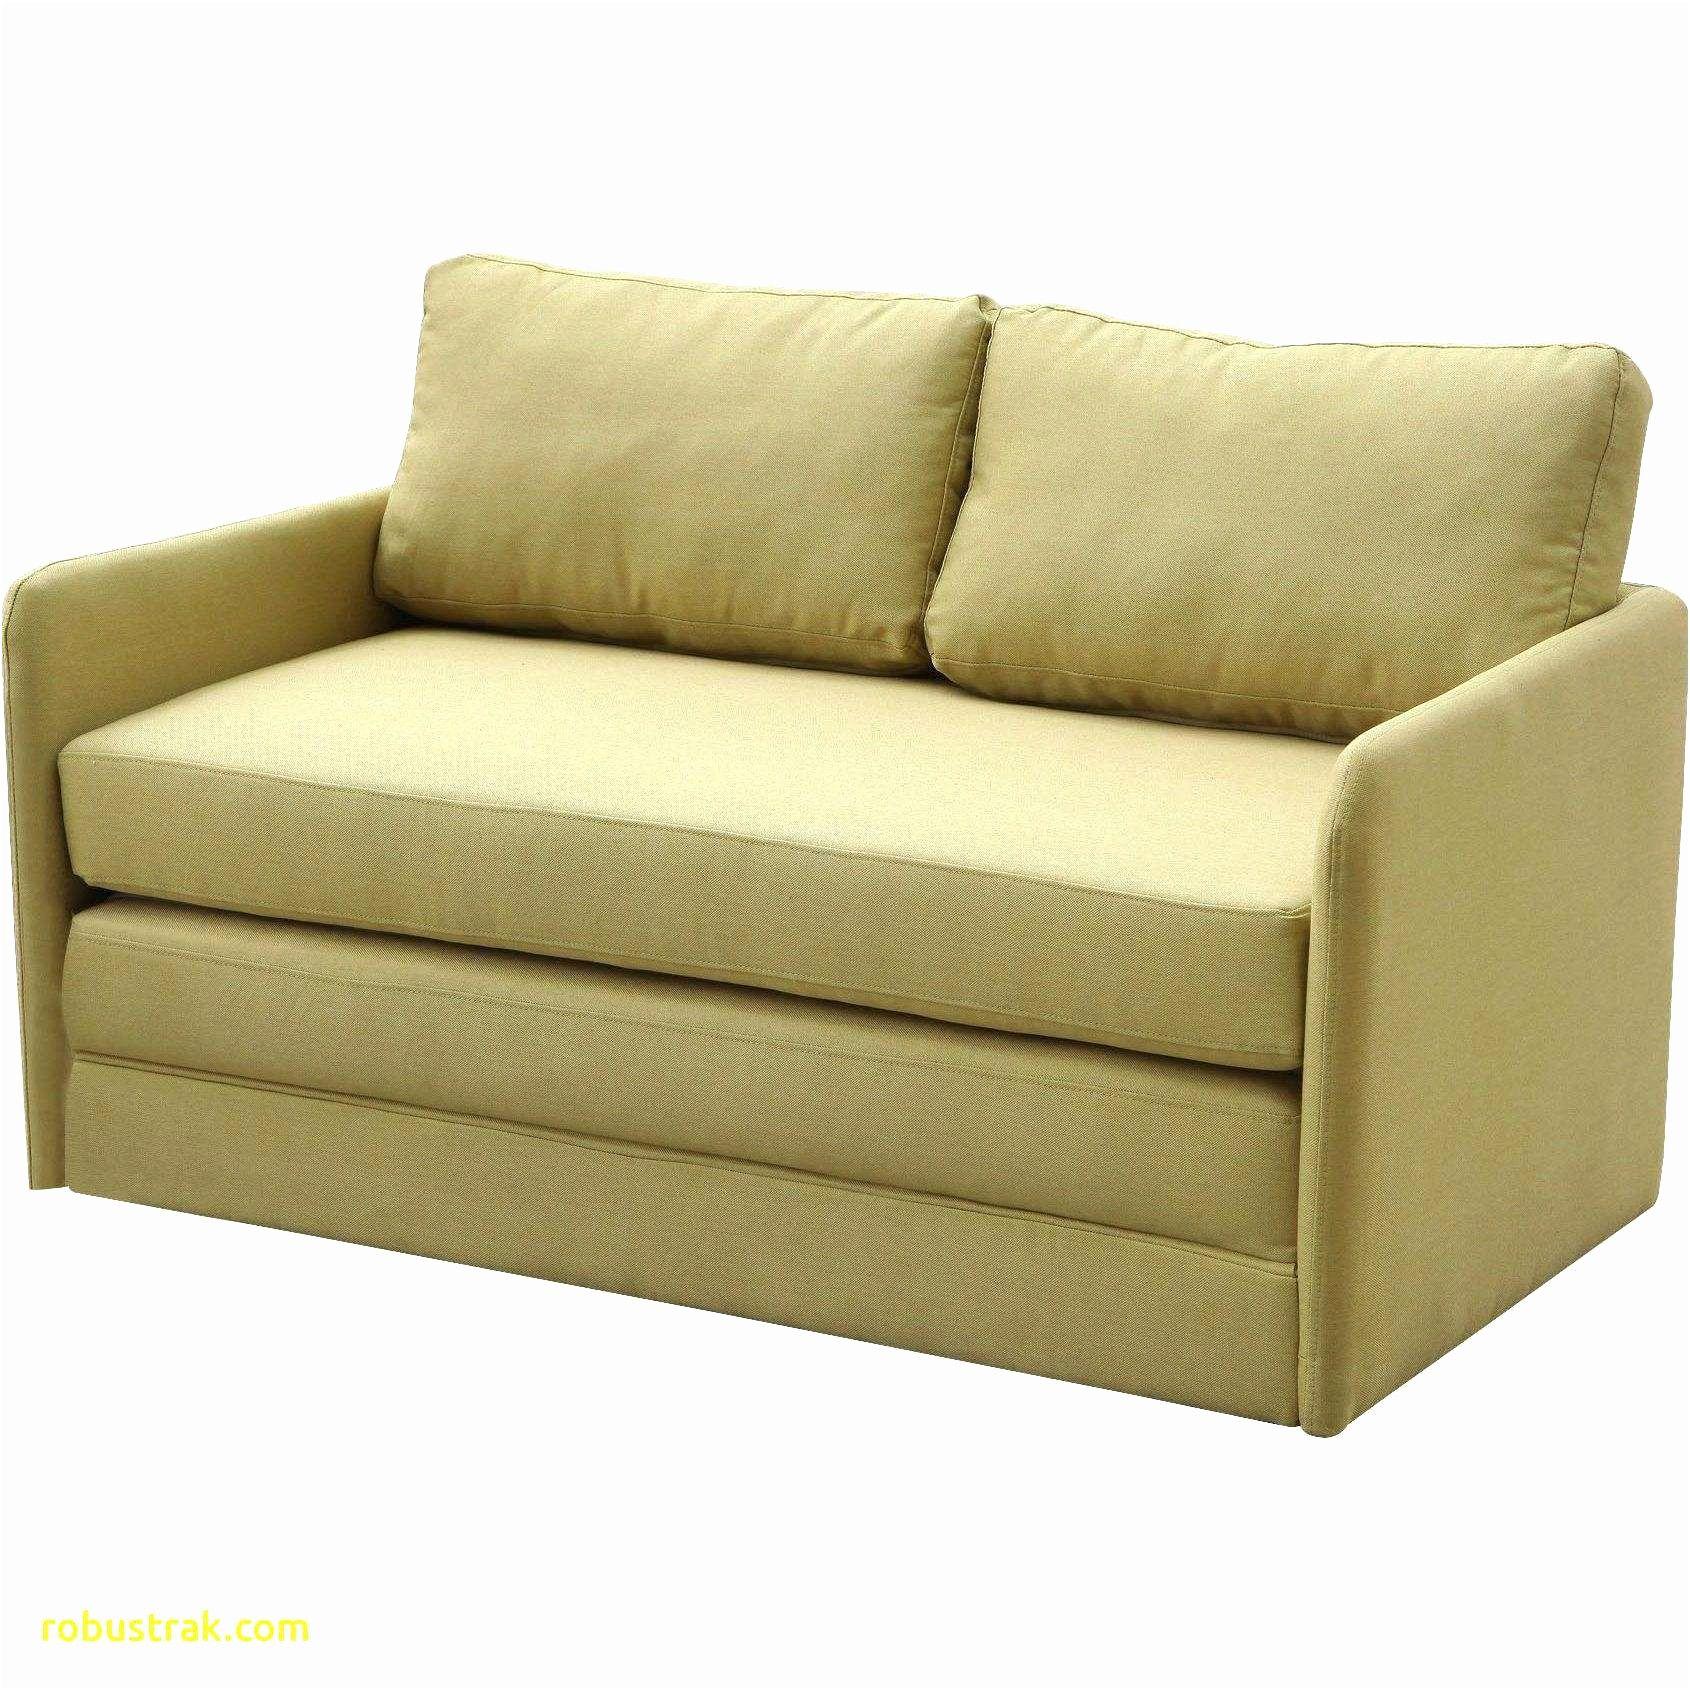 Harmonisch Sofa Grau Vintage